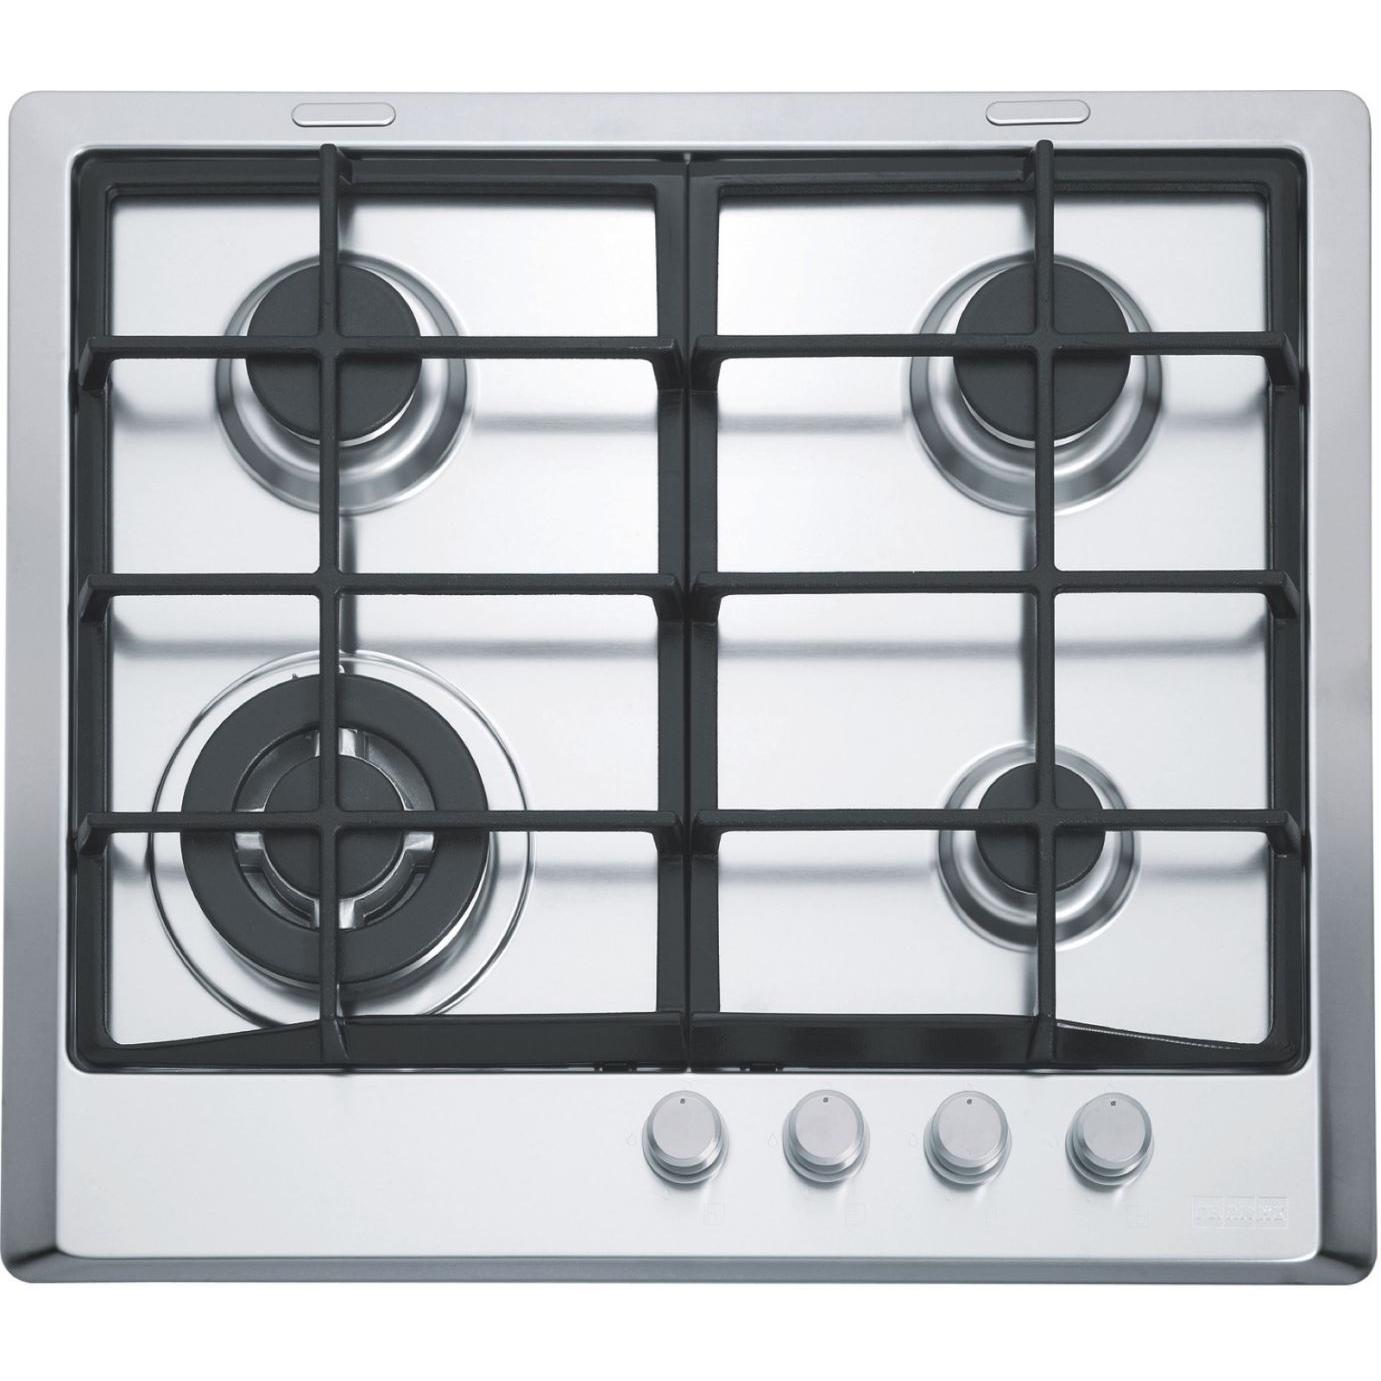 Plita incorporabila Franke Multi Cooking 600 FHM 604 3G TC XS C, 4 arzatoare gaz, 60 cm, Fonta, Inox